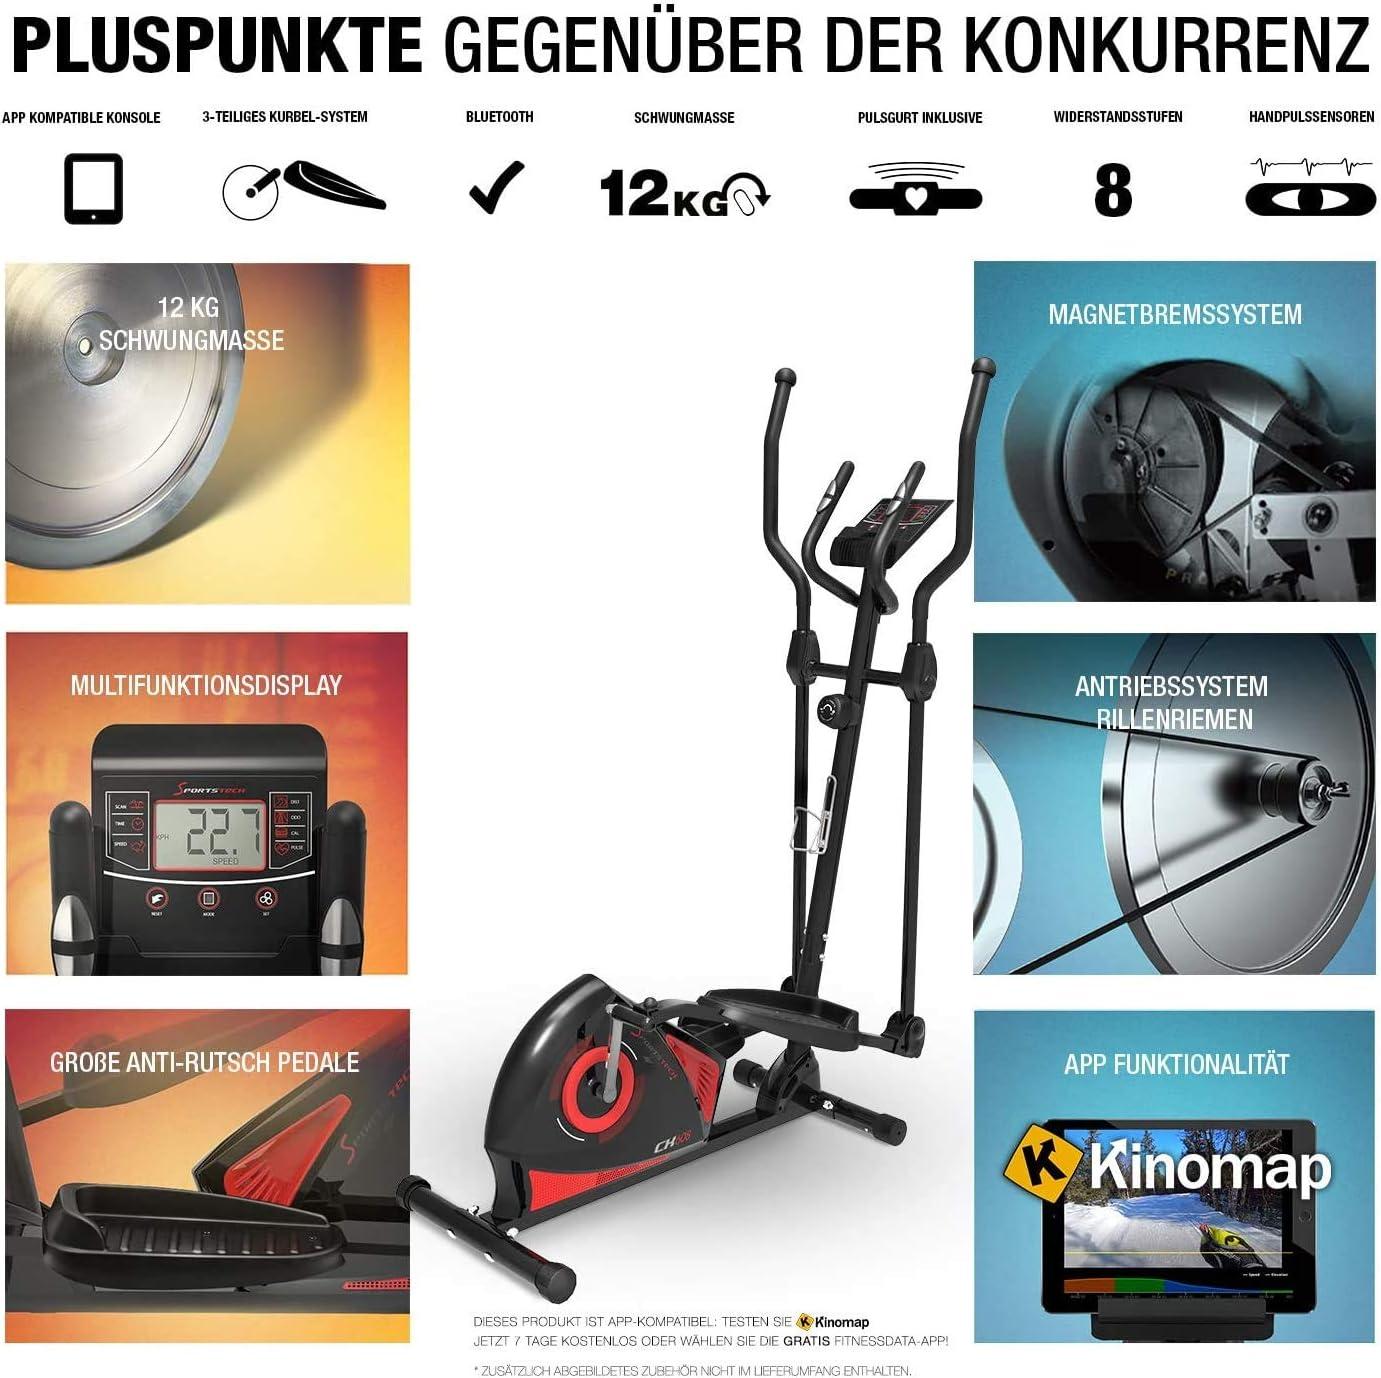 Sportstech CX608 Crosstrainer Funktionsumfang